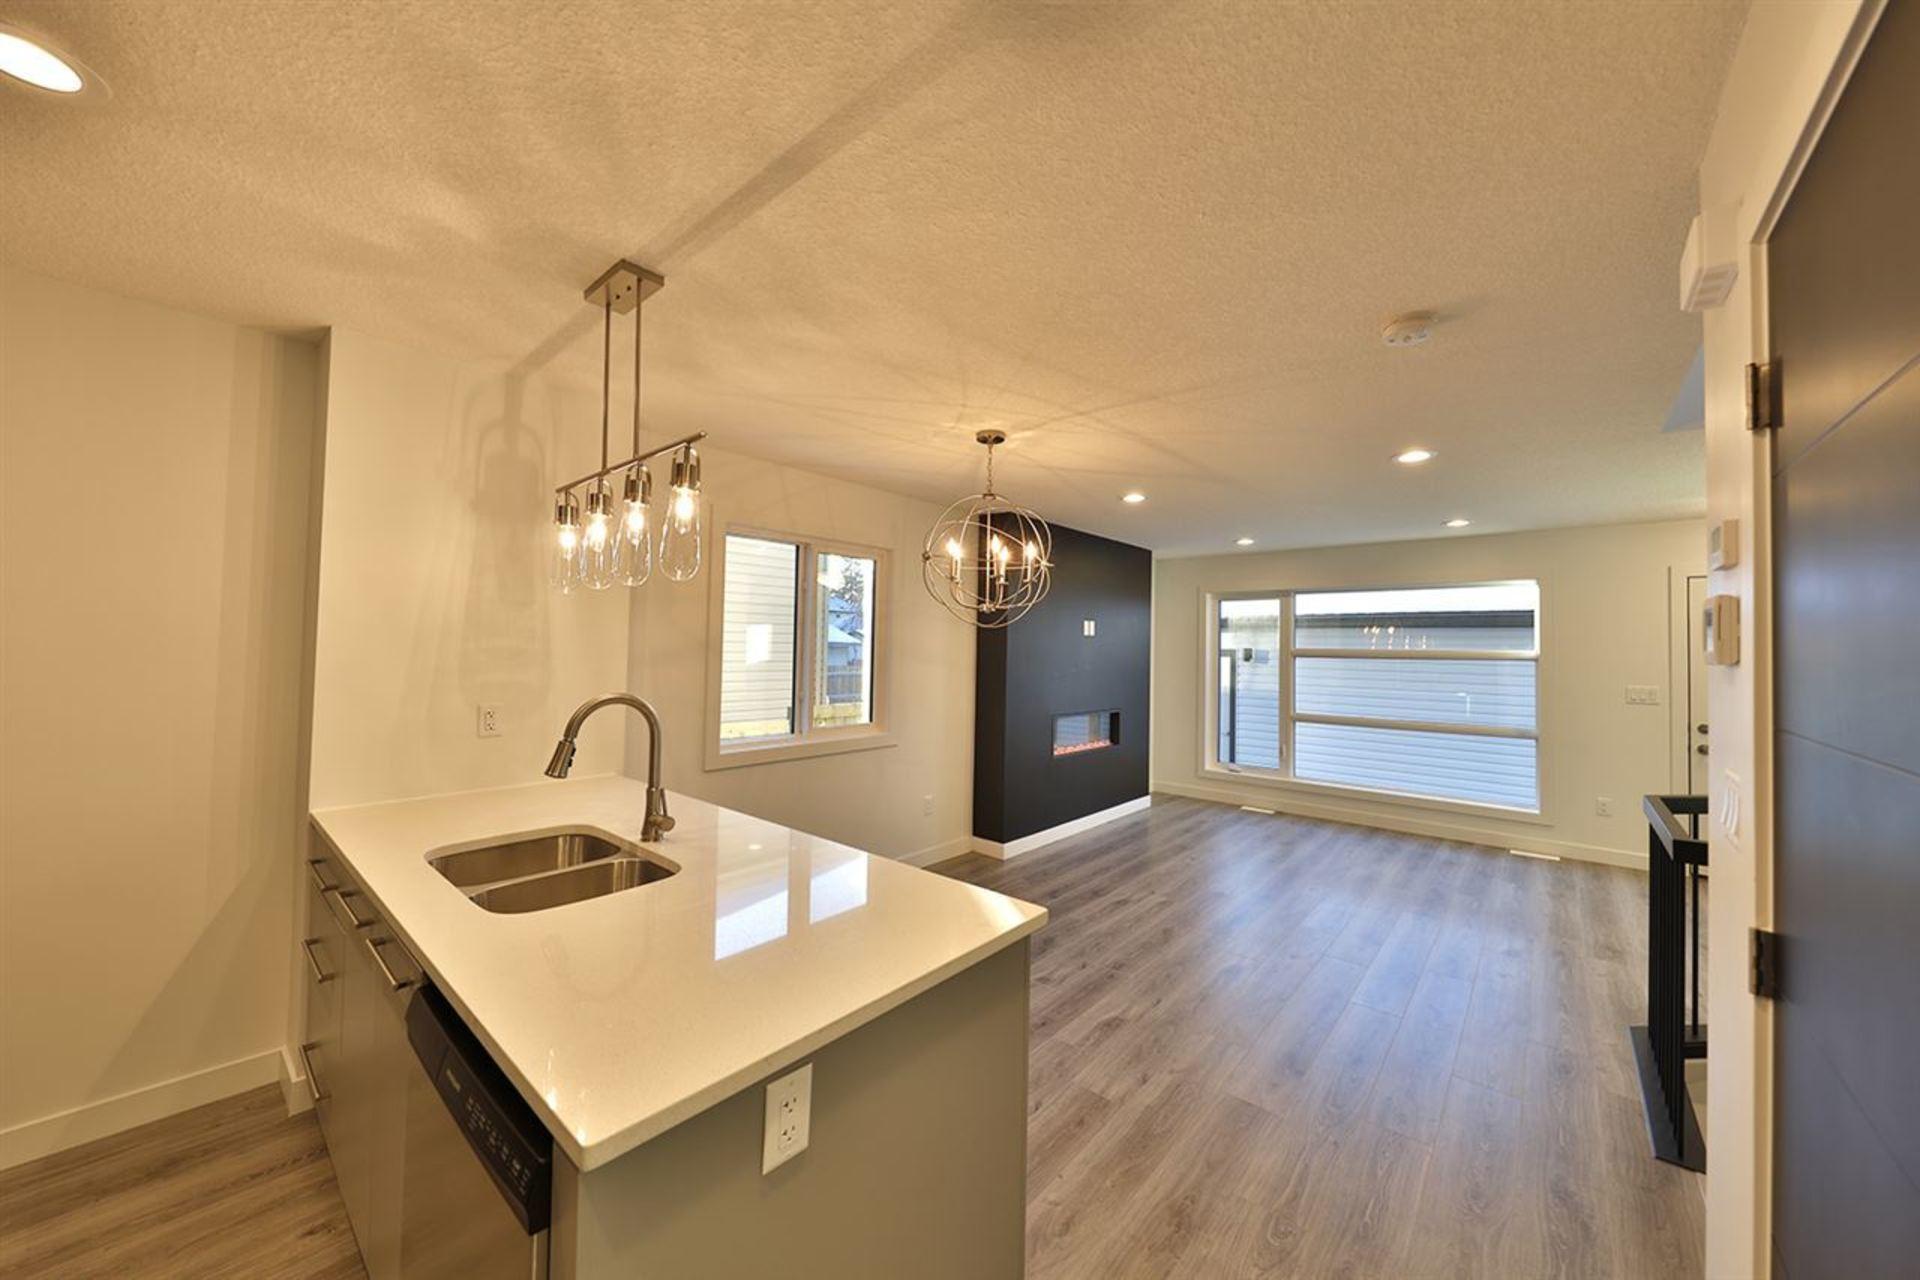 11638-84-street-parkdale_edmo-edmonton-02 at 11638 84 Street, Parkdale_EDMO, Edmonton